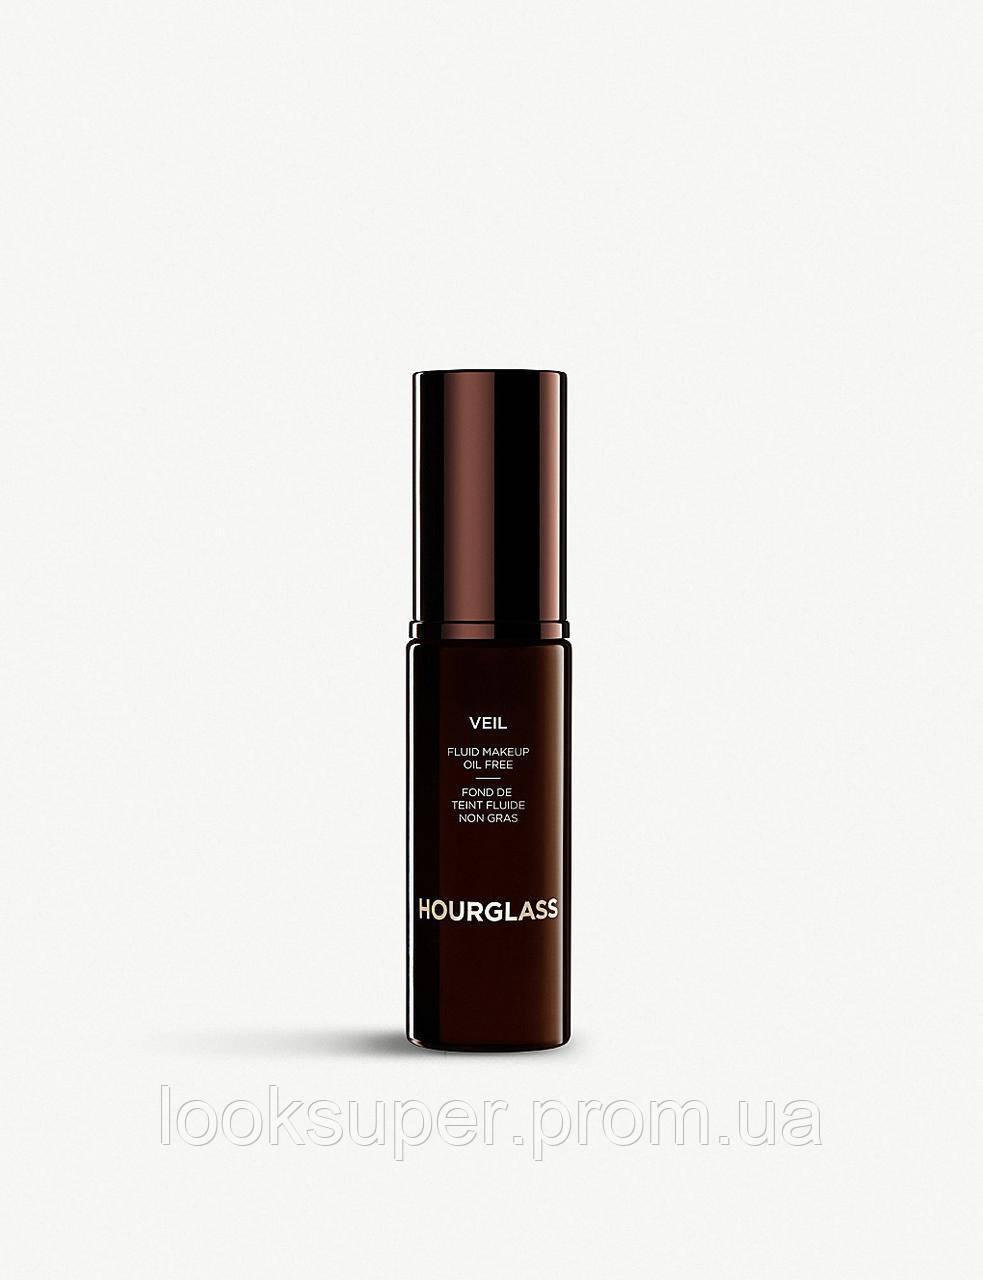 Флюид Hourglass Veil Fluid Makeup